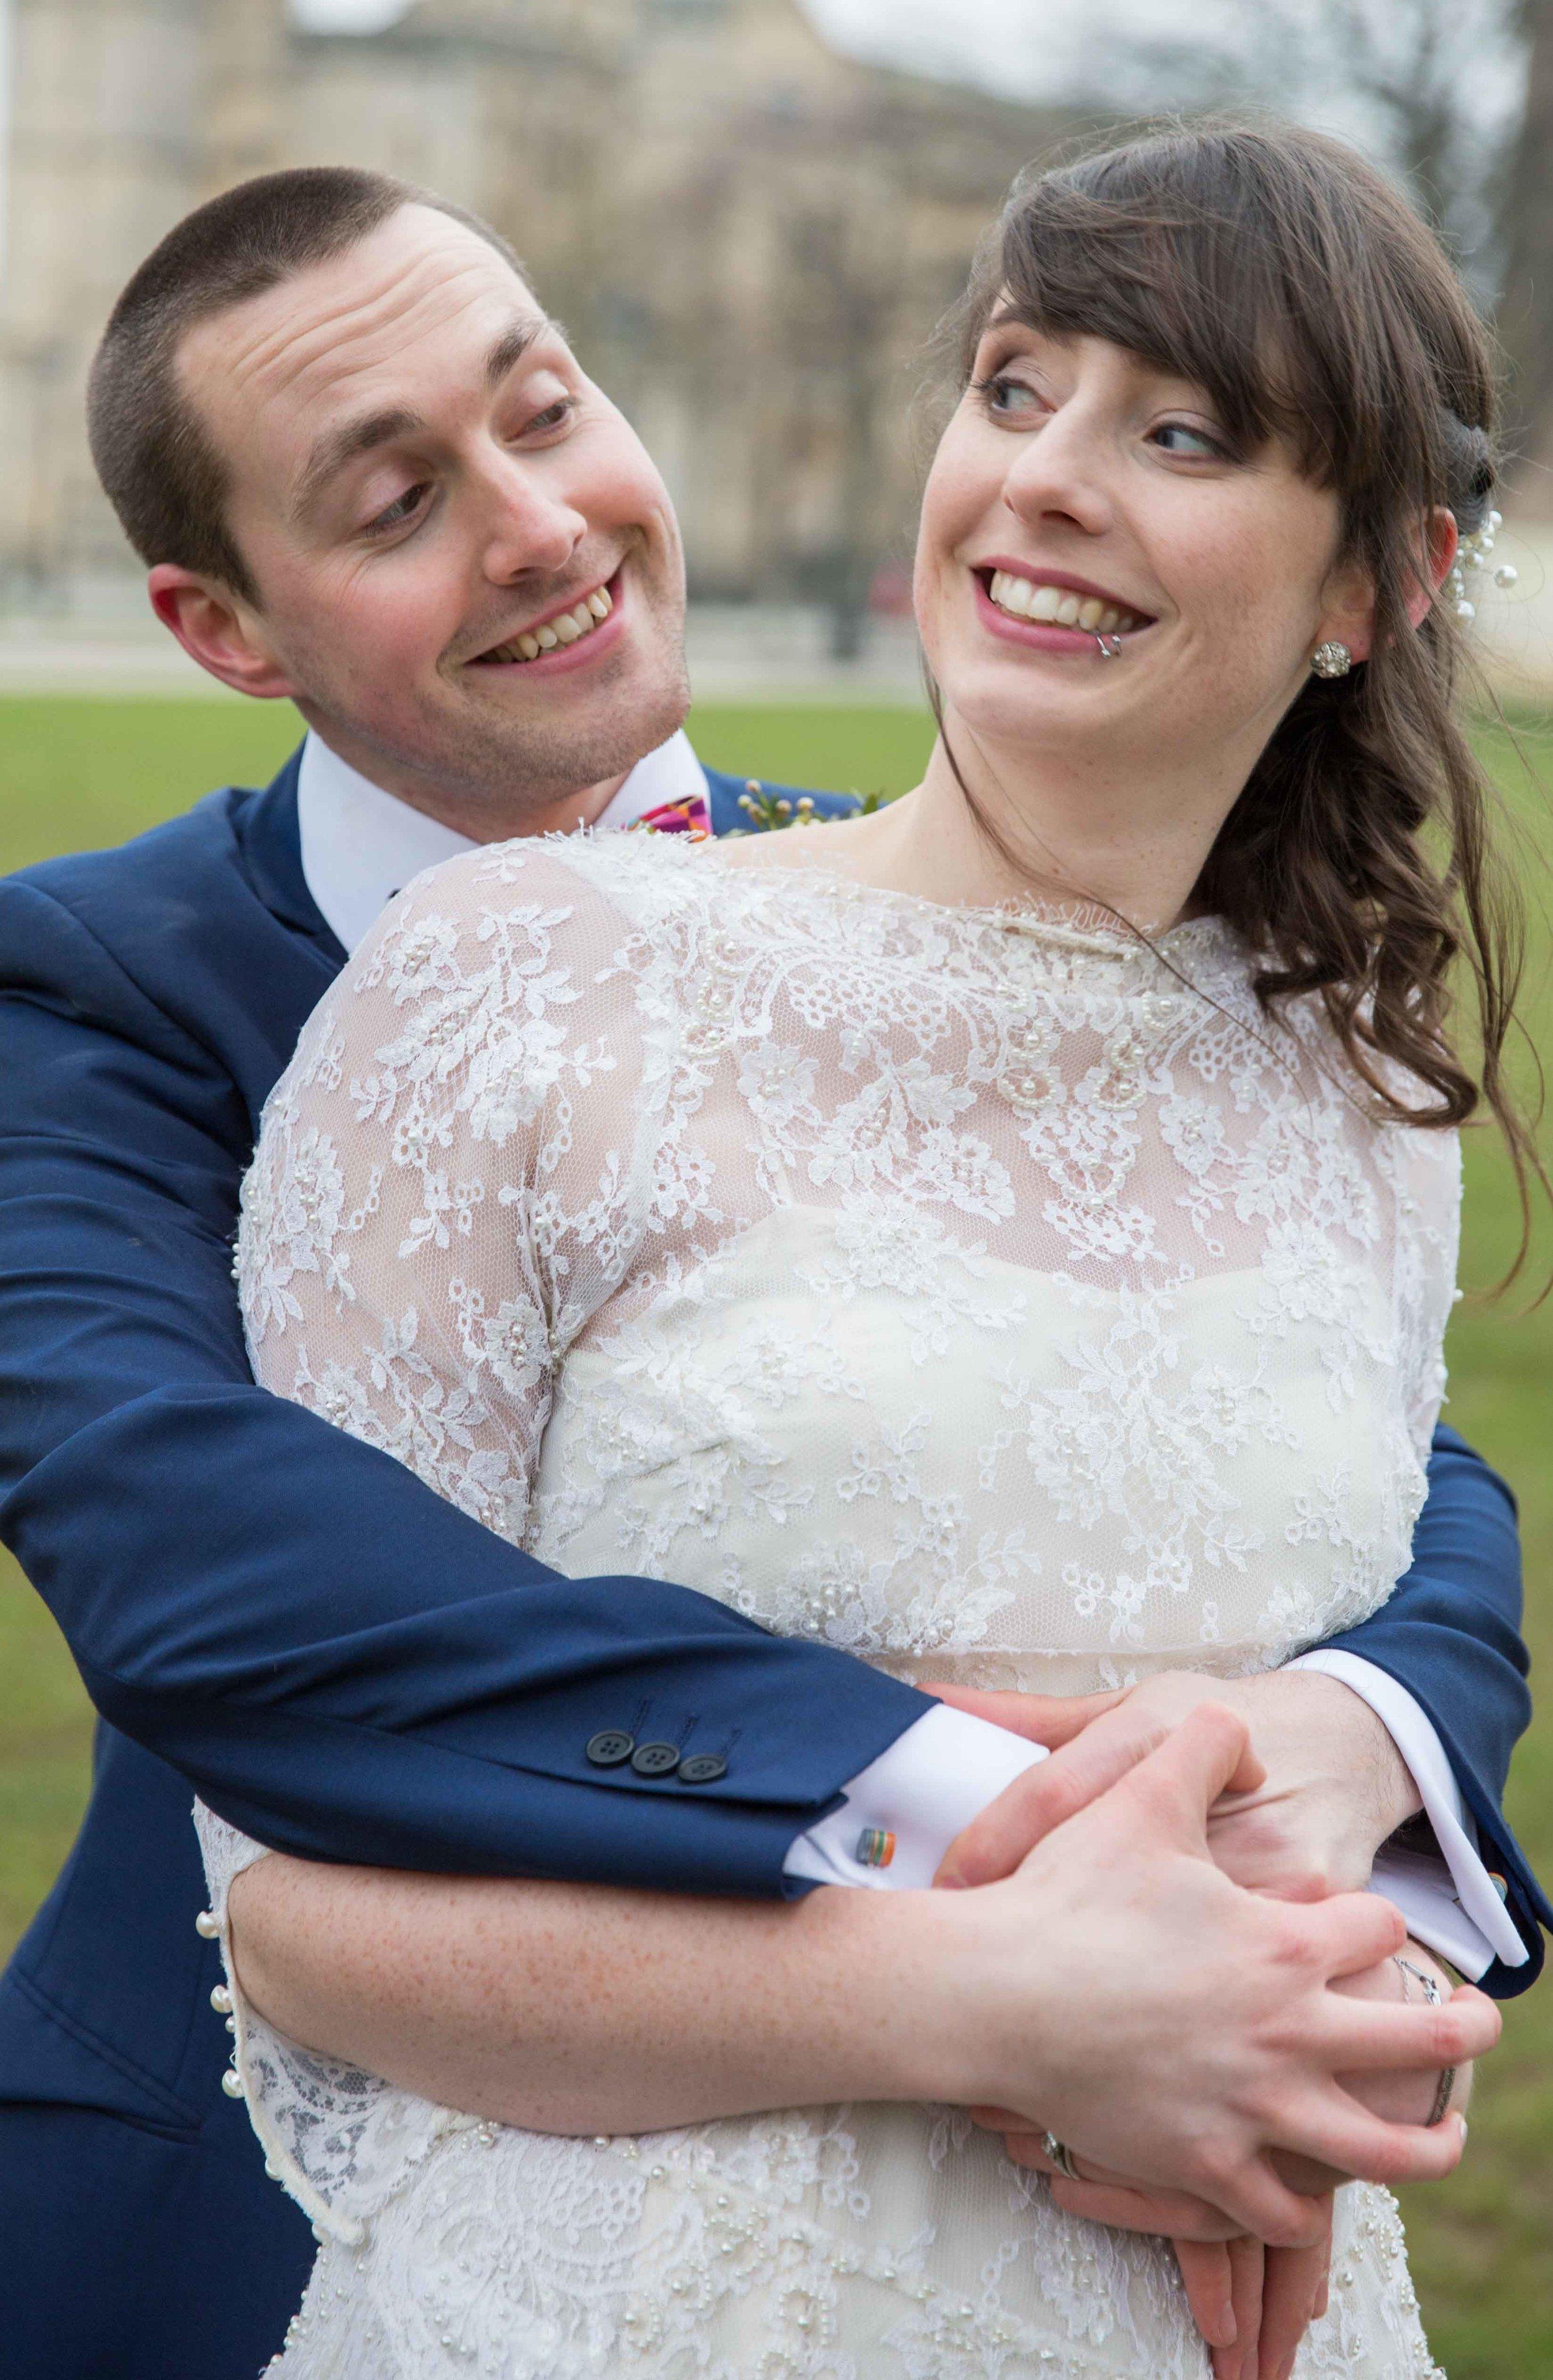 Adam & Faye - Wright Wedding Photography - Bristol Wedding Photographer -282.jpg